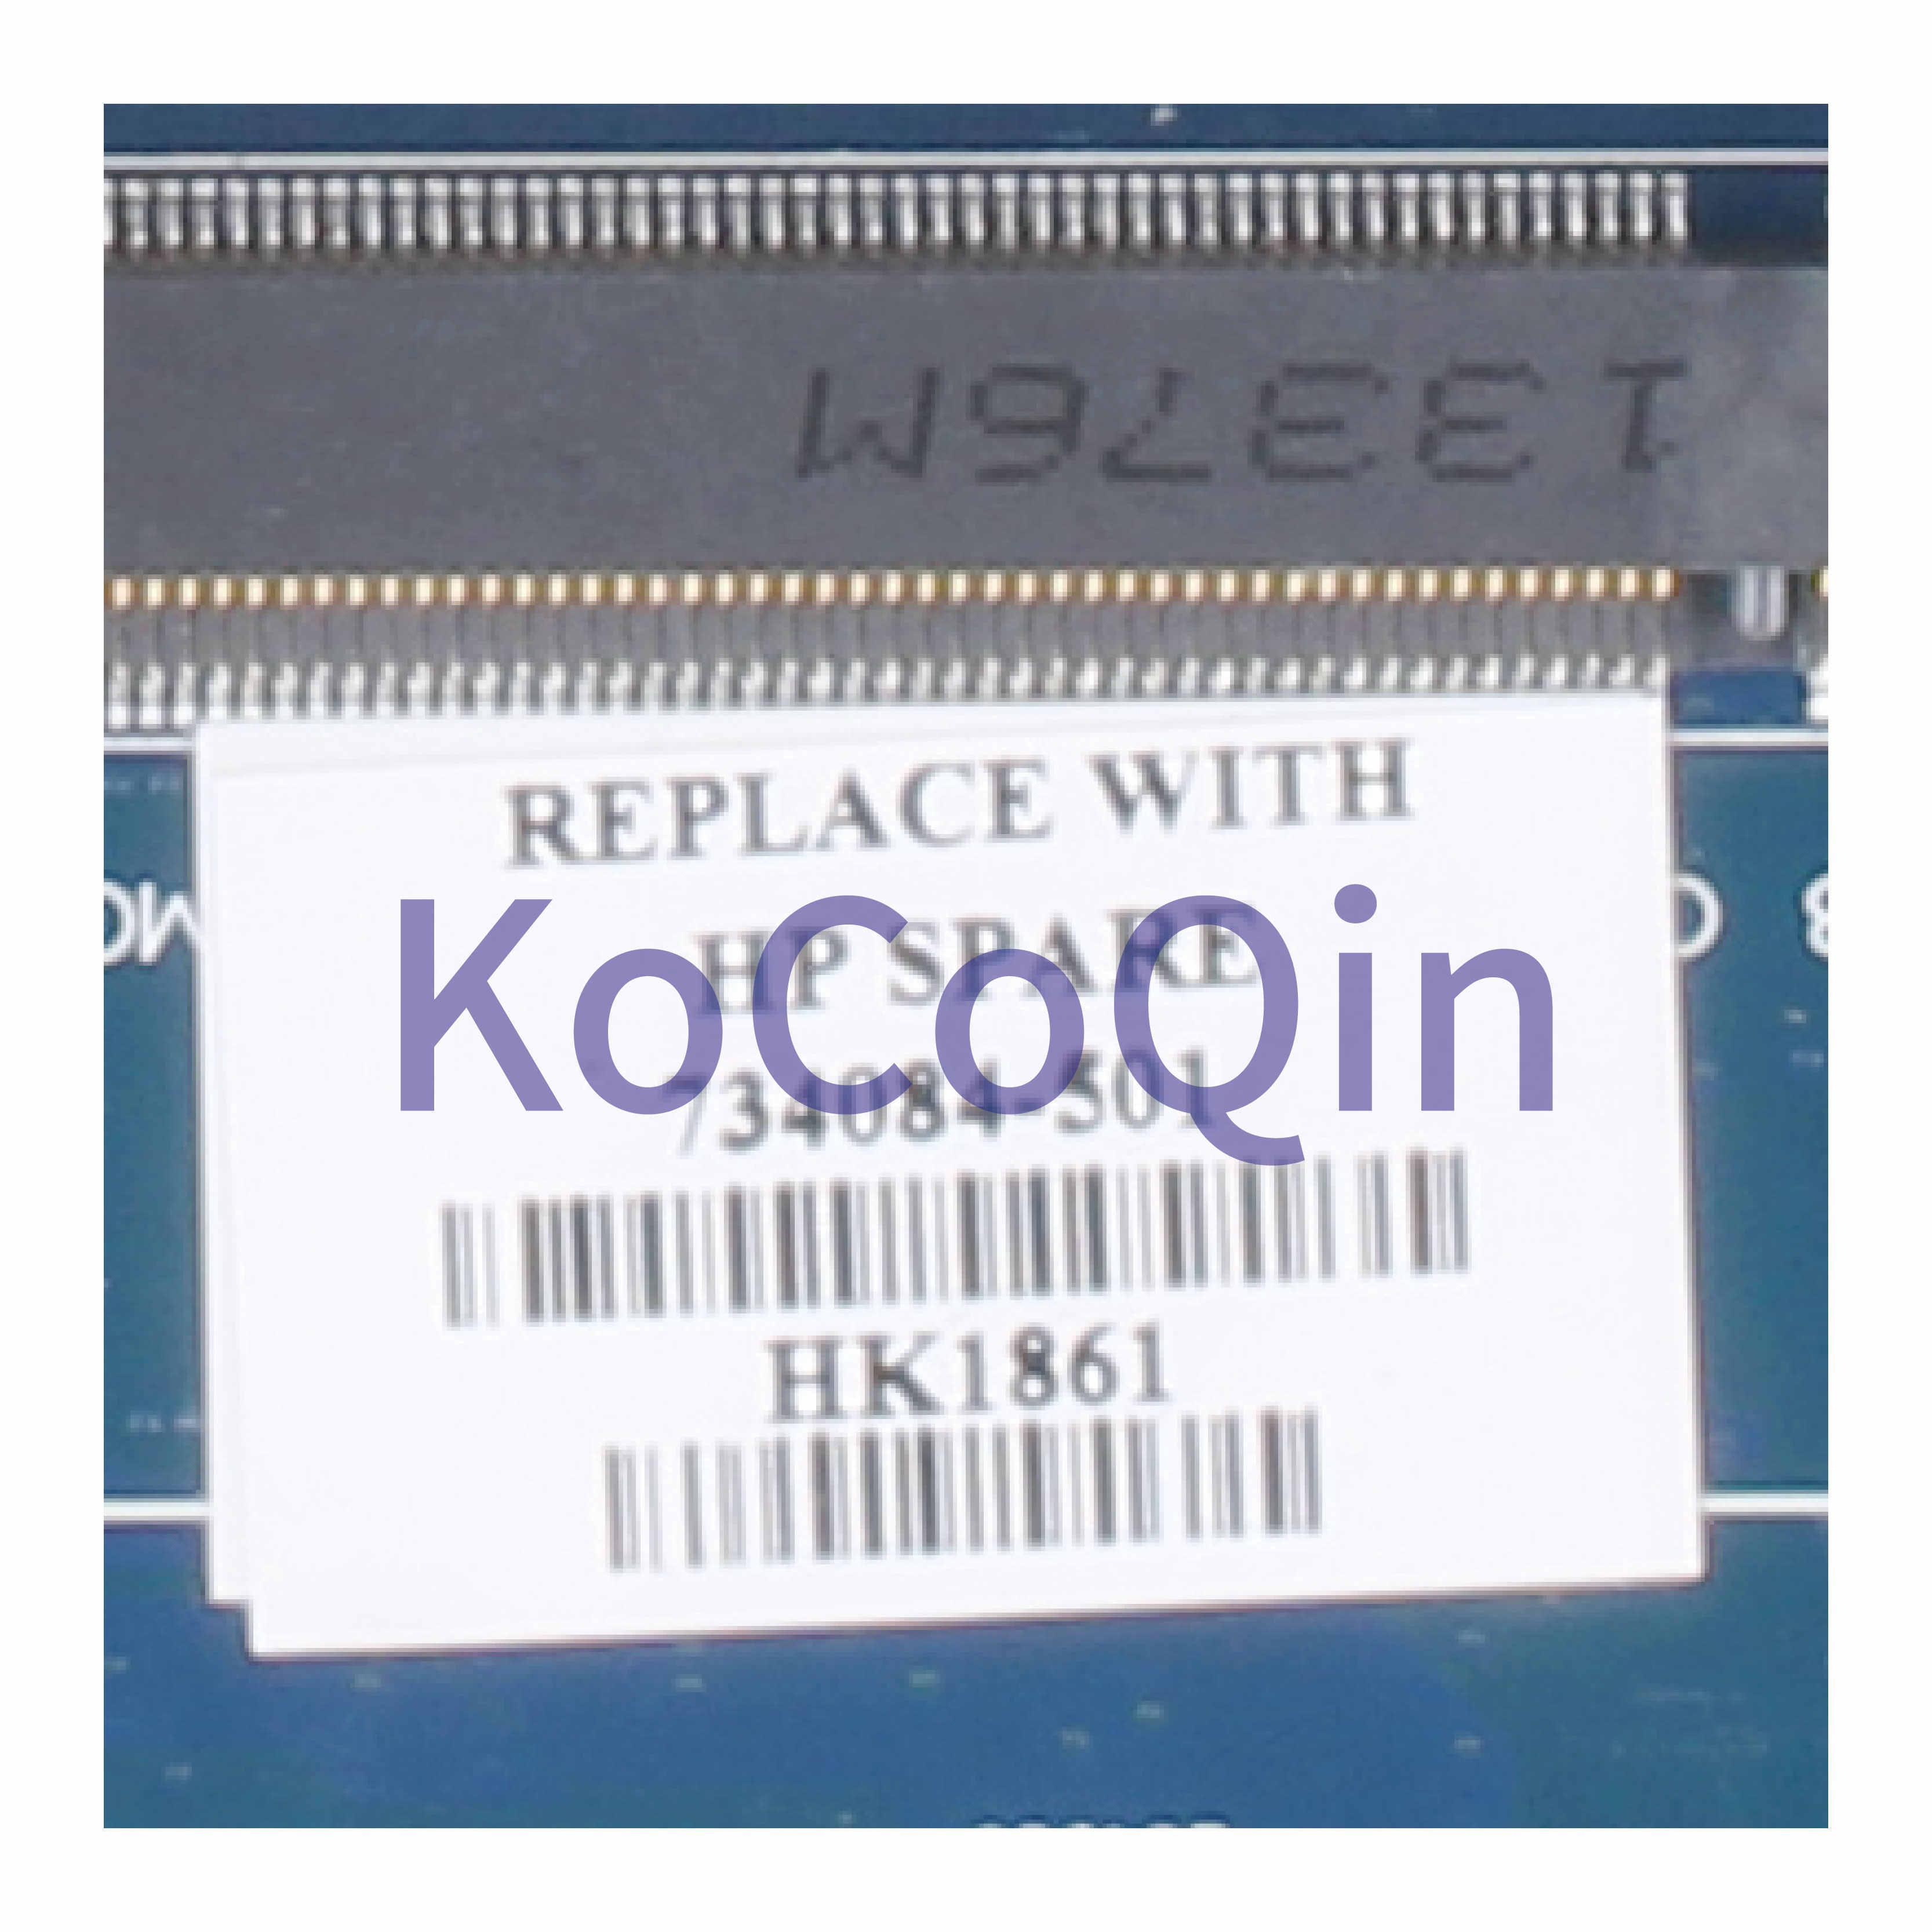 KoCoQin Laptop motherboard Para HP Probook 440 G1 450 G1 Mainboard 12241-1 734084-SR17D 001 734084-501 216-084200